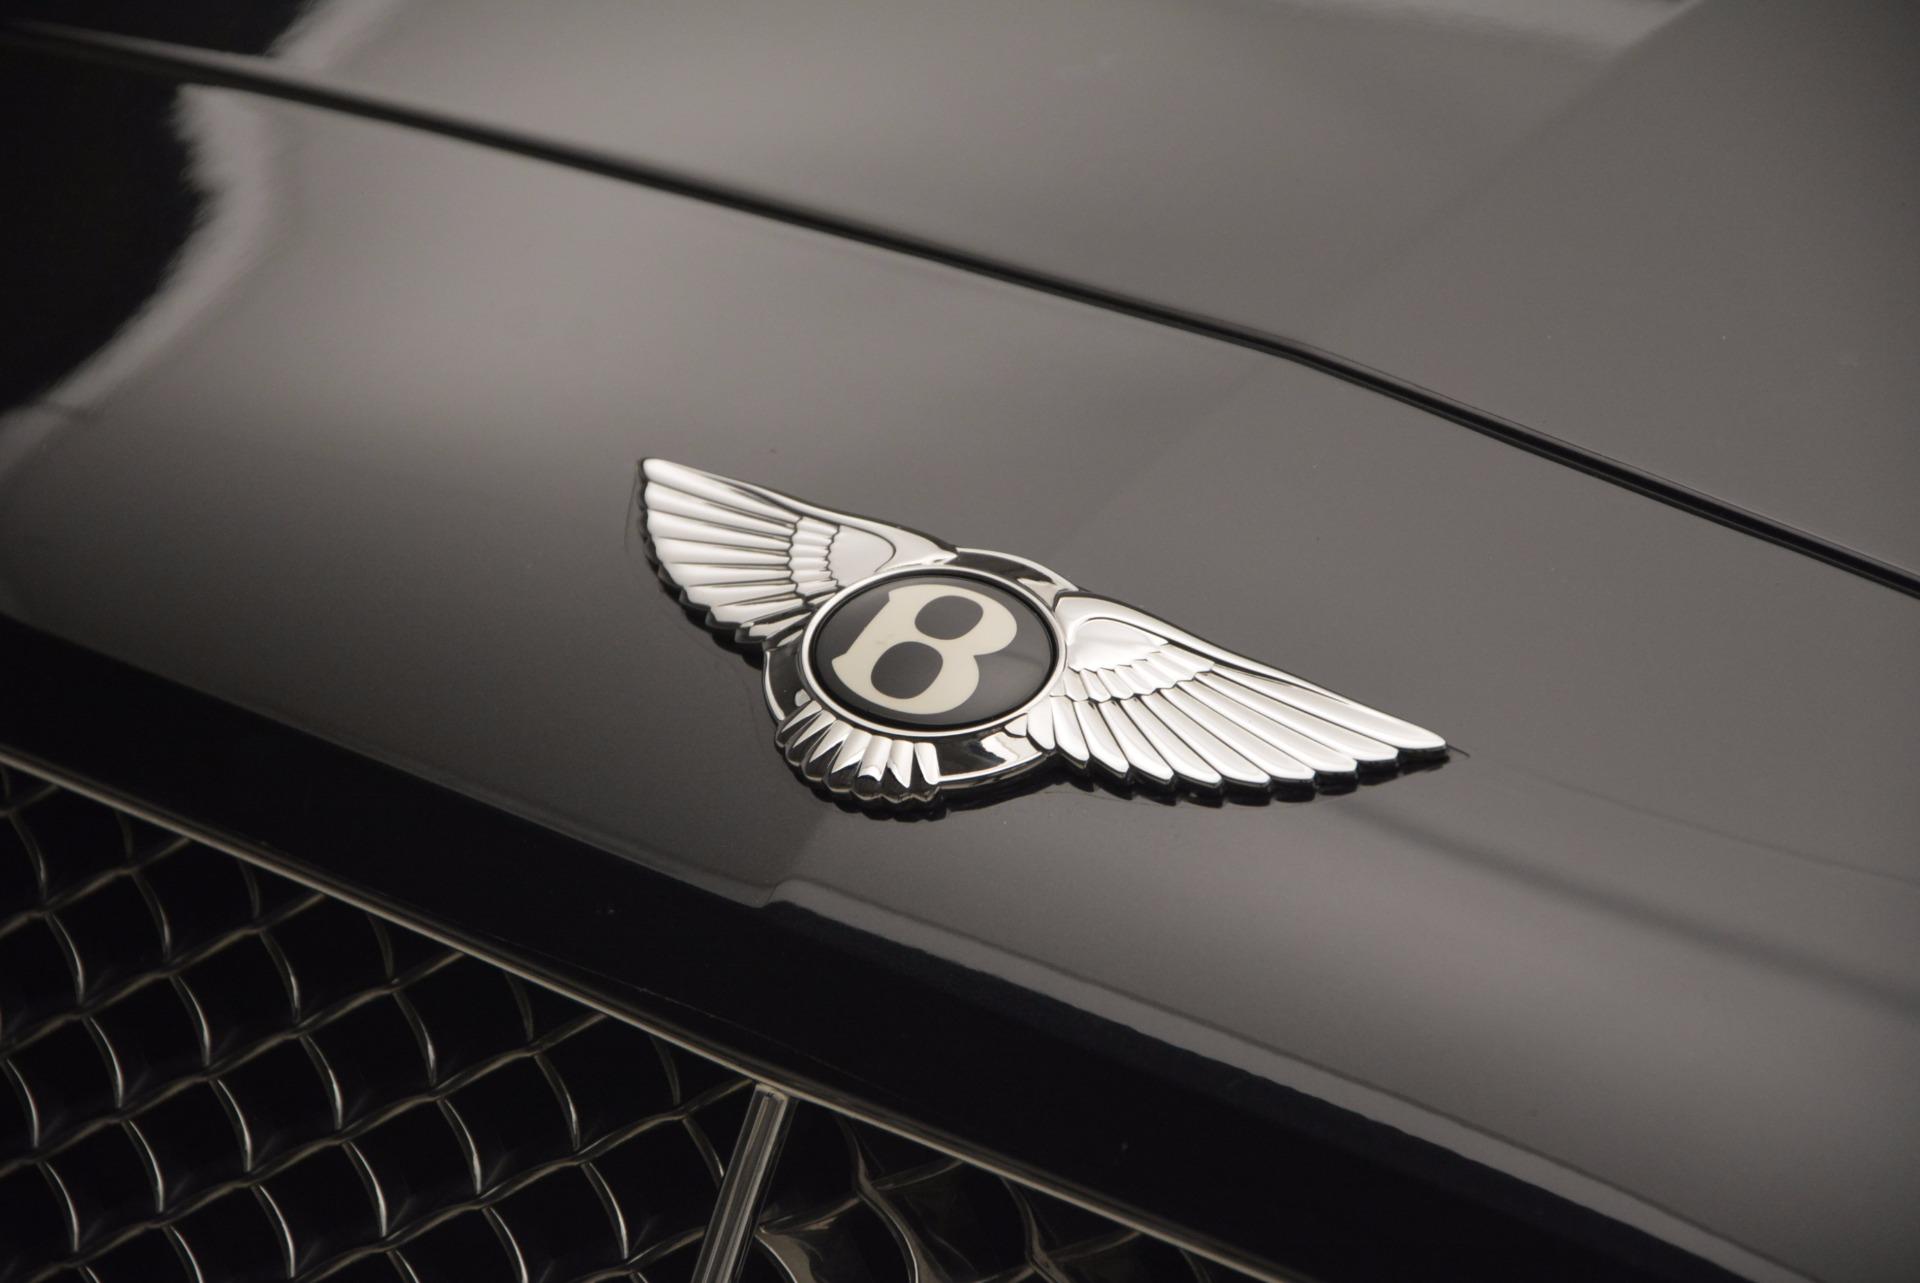 Used 2010 Bentley Continental GT Speed For Sale In Westport, CT 1298_p26